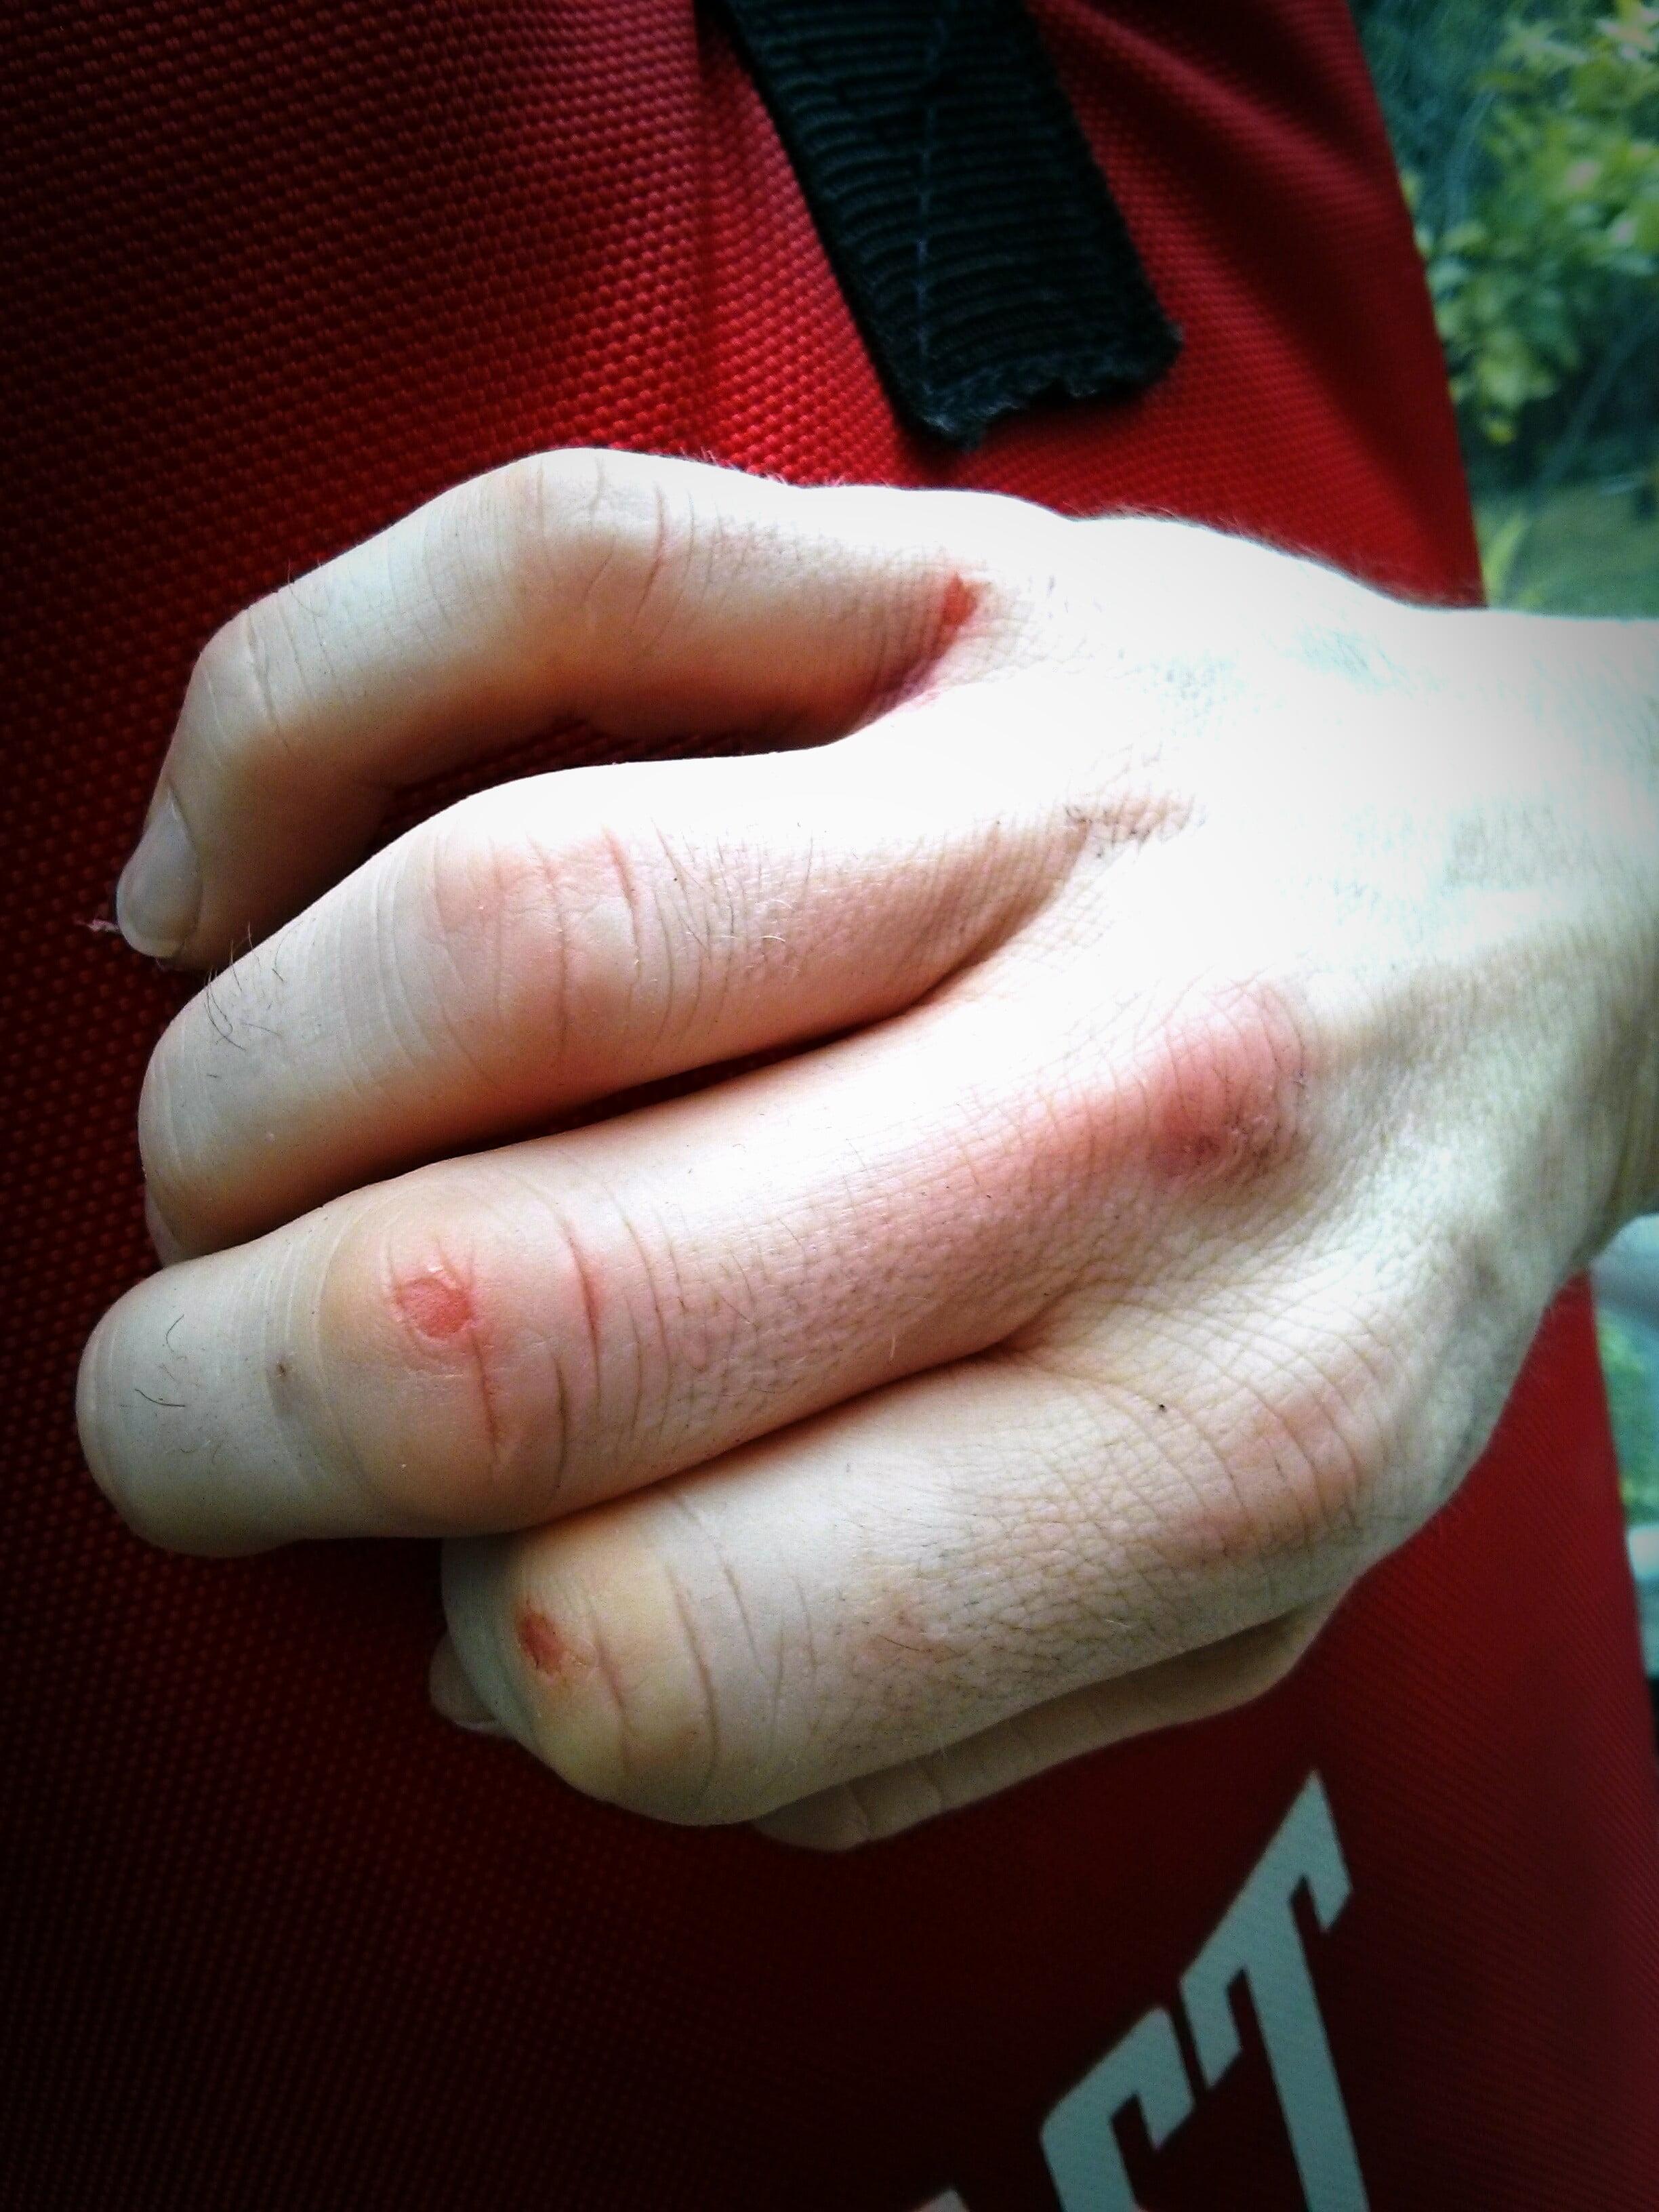 skinned knuckles